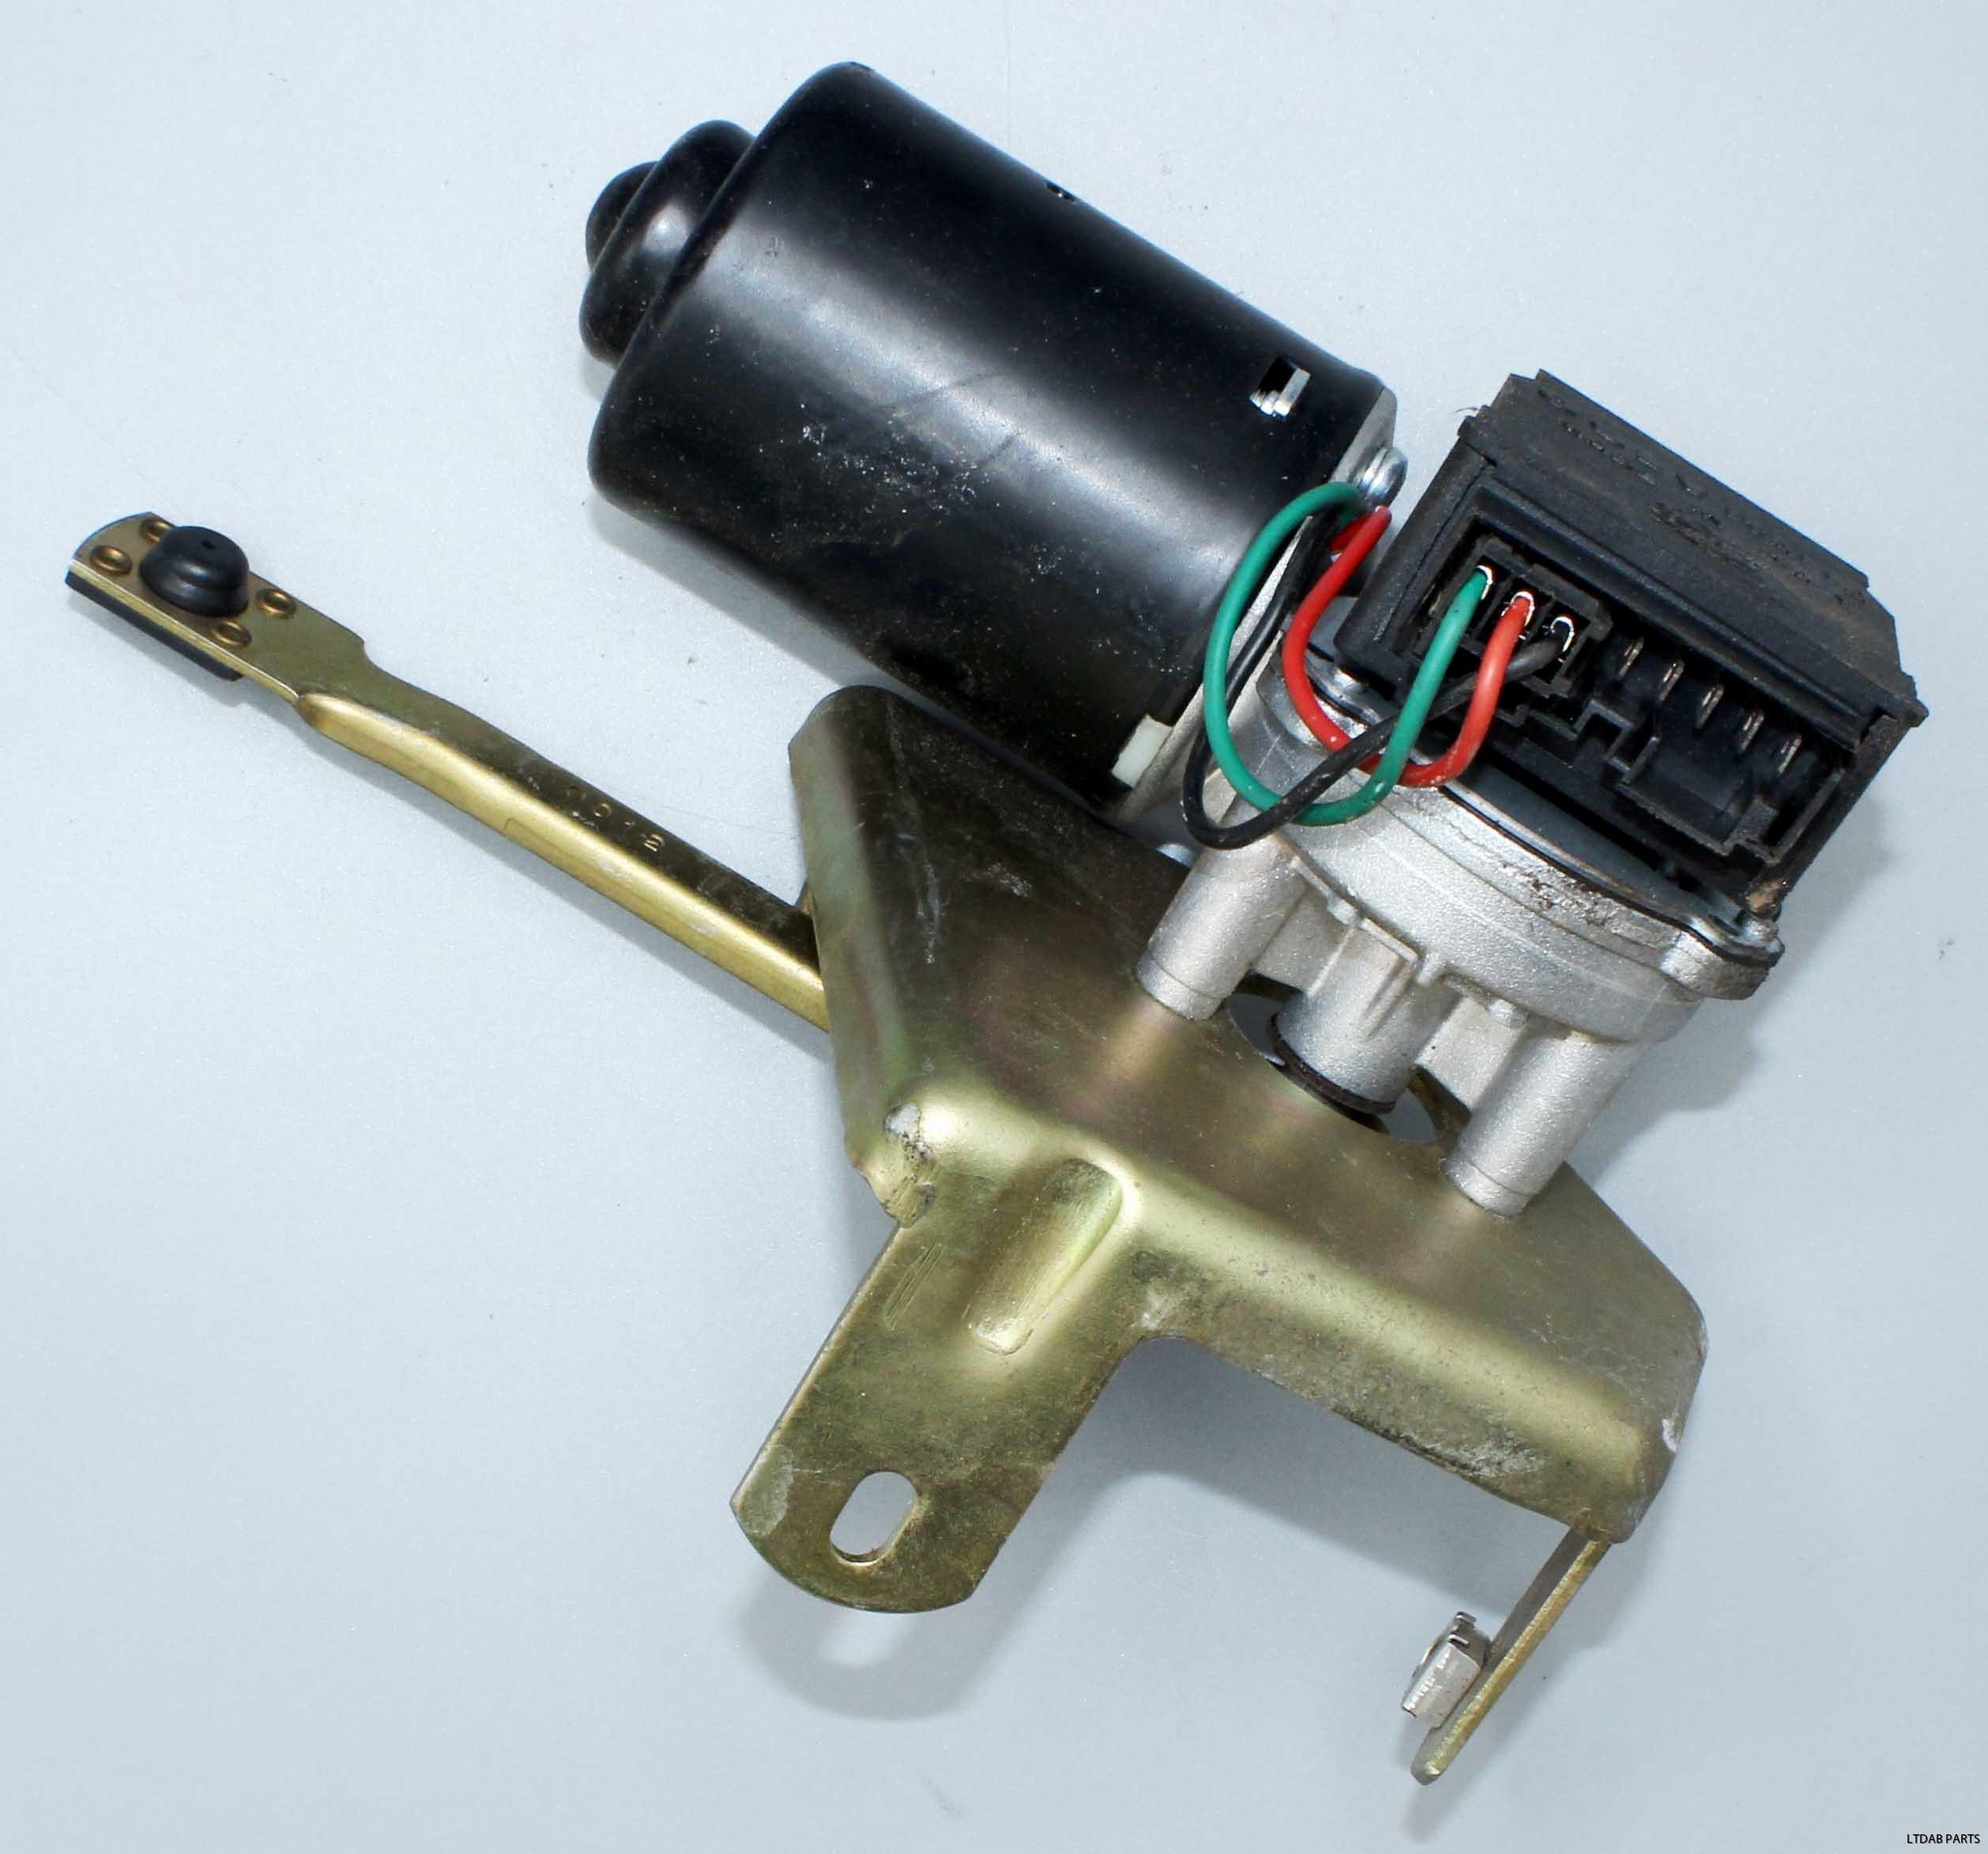 r9900001 torkarmotor